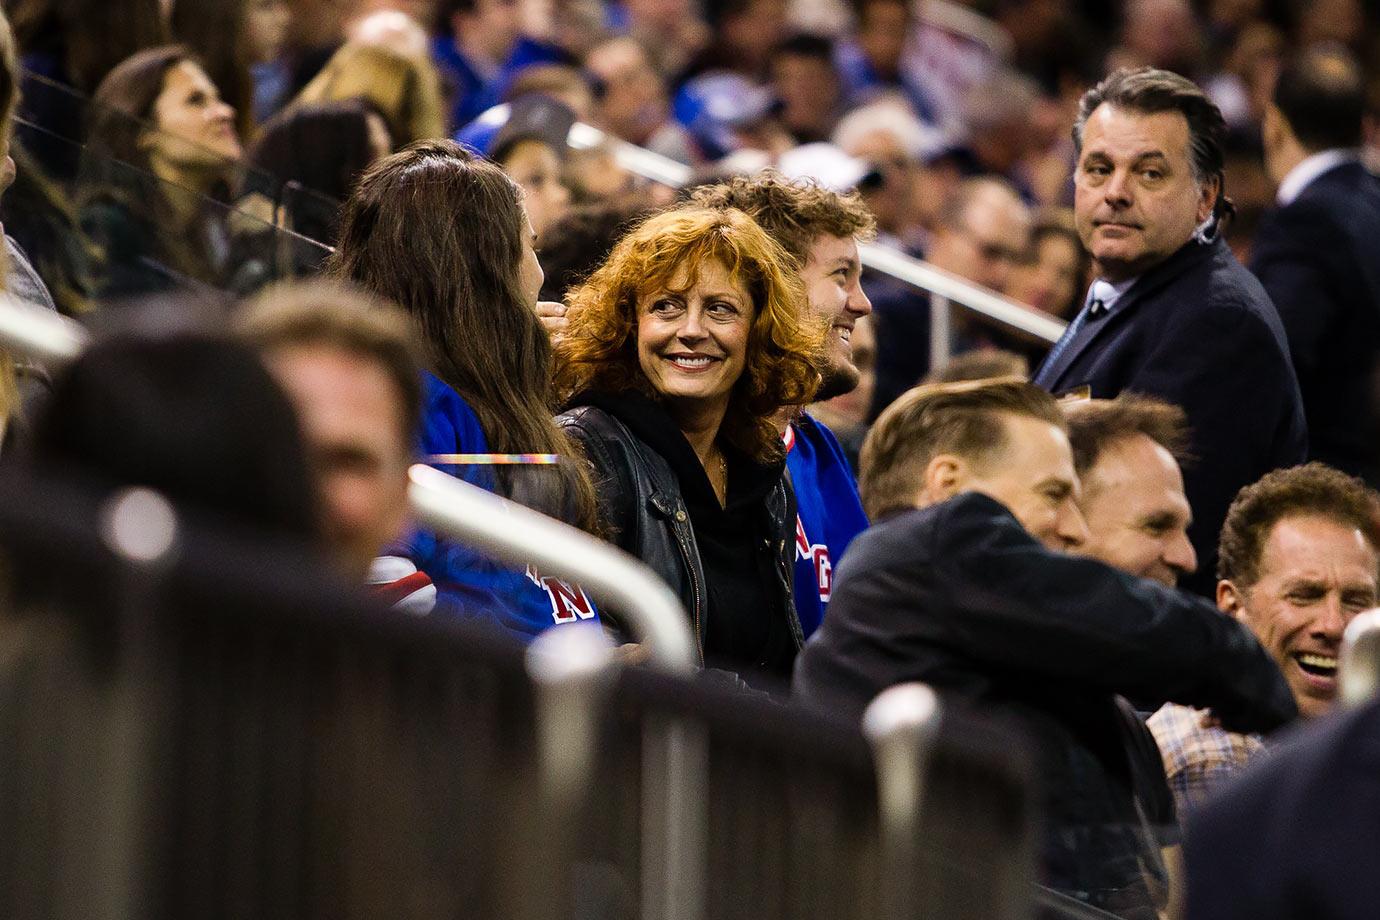 New York Rangers vs. Washington Capitals on November 3, 2015 at Madison Square Garden in New York City.